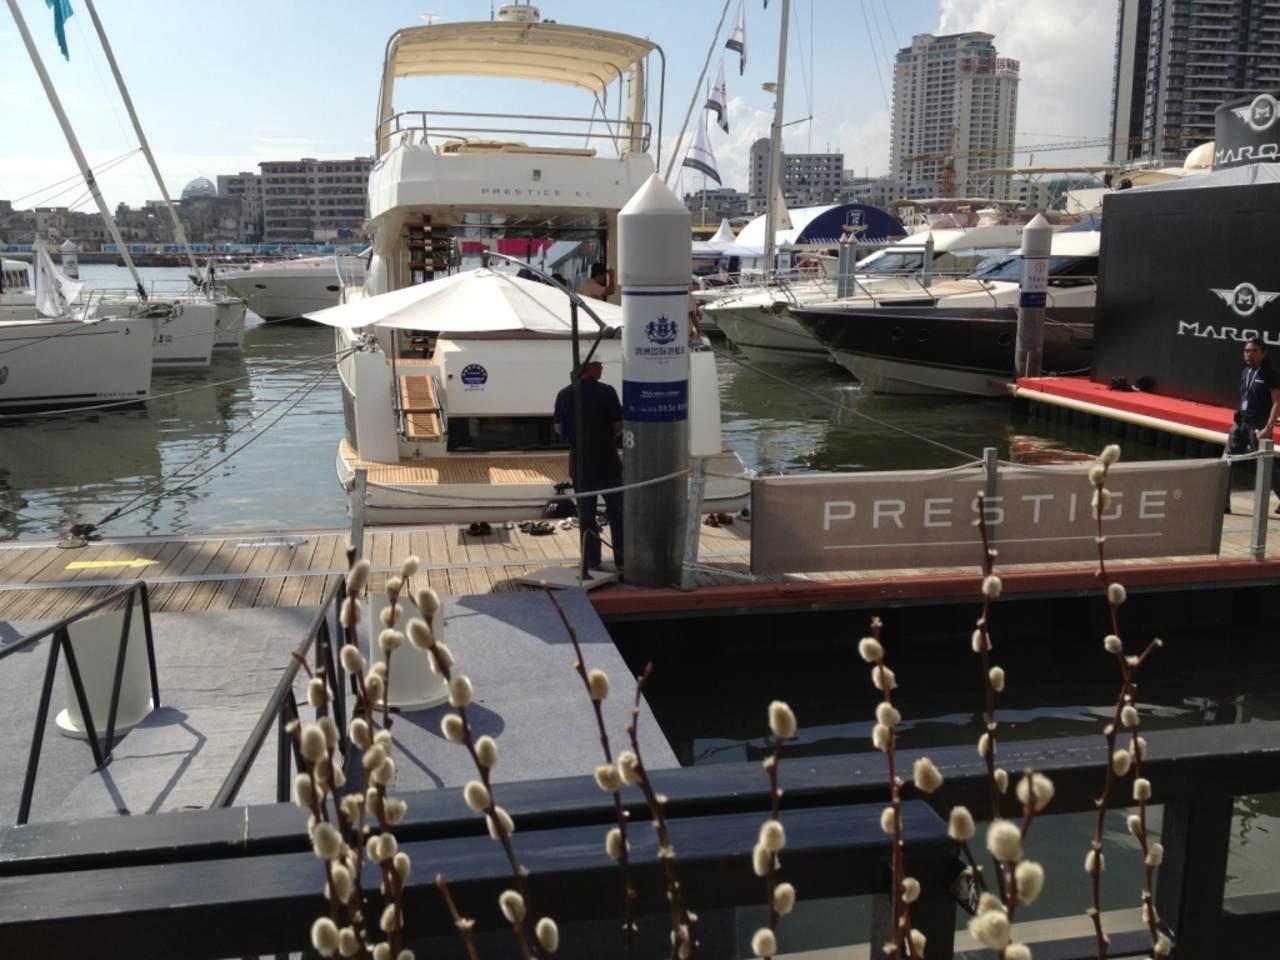 Jeanneau and Prestige in Hainan Rendez-vous boatshow 3